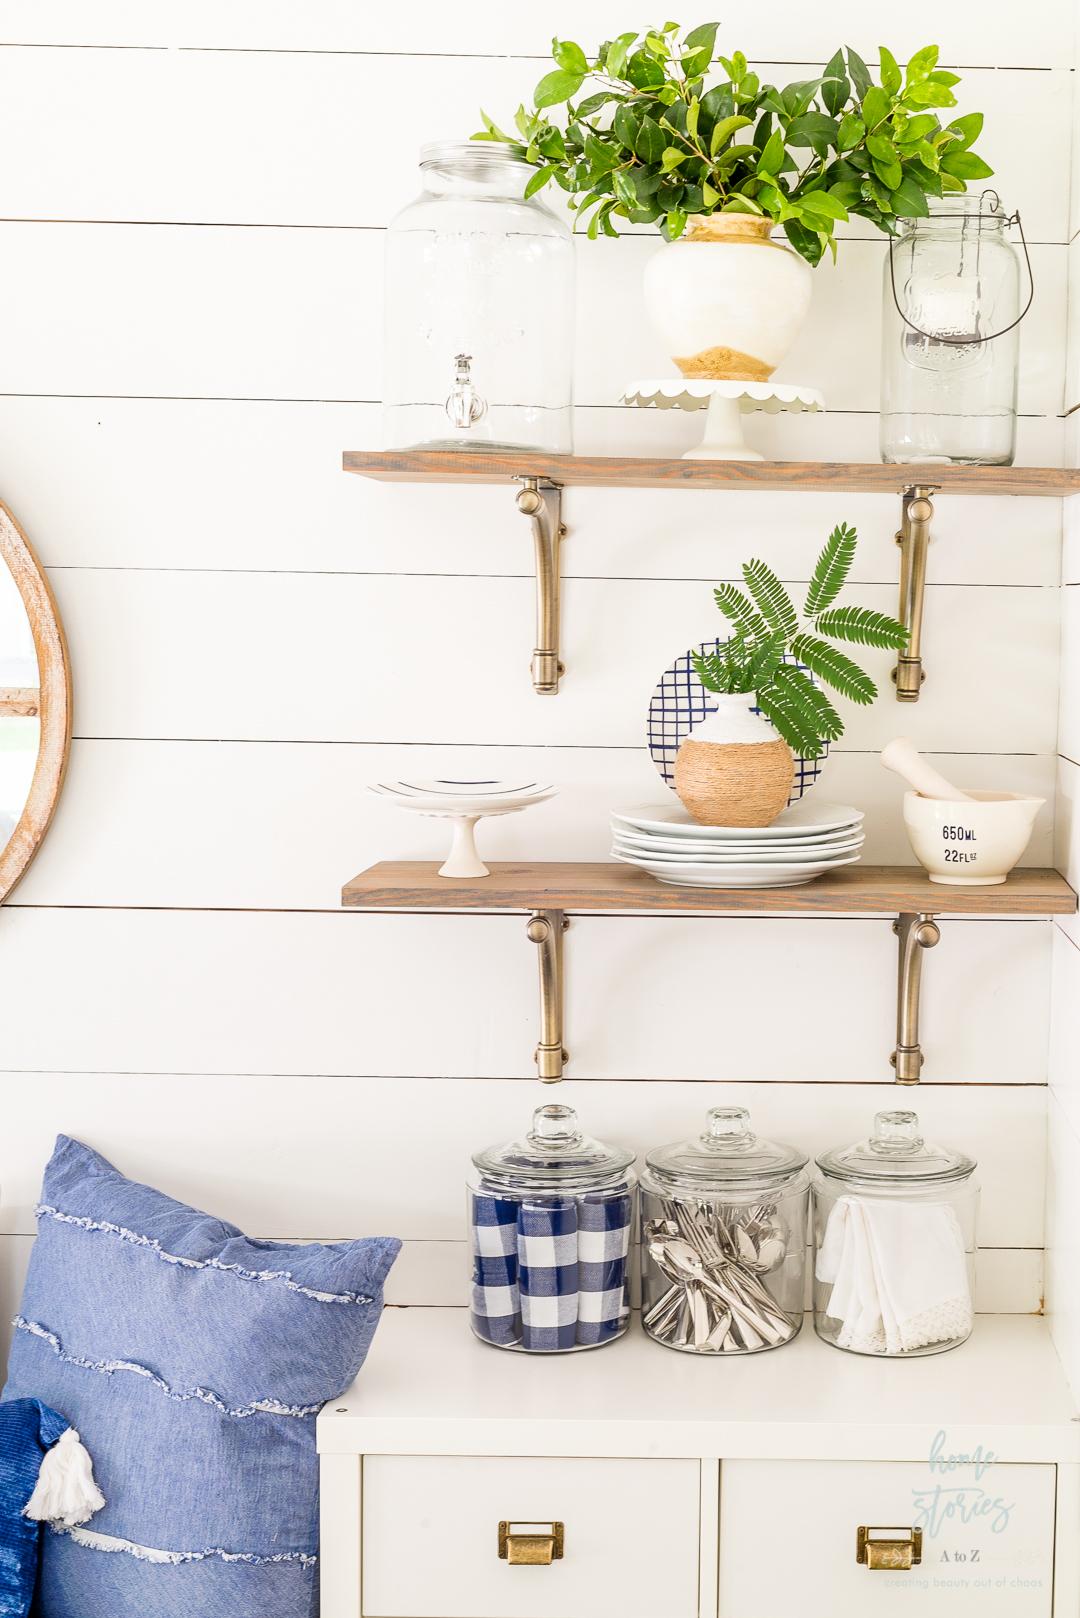 styled kitchen shelves